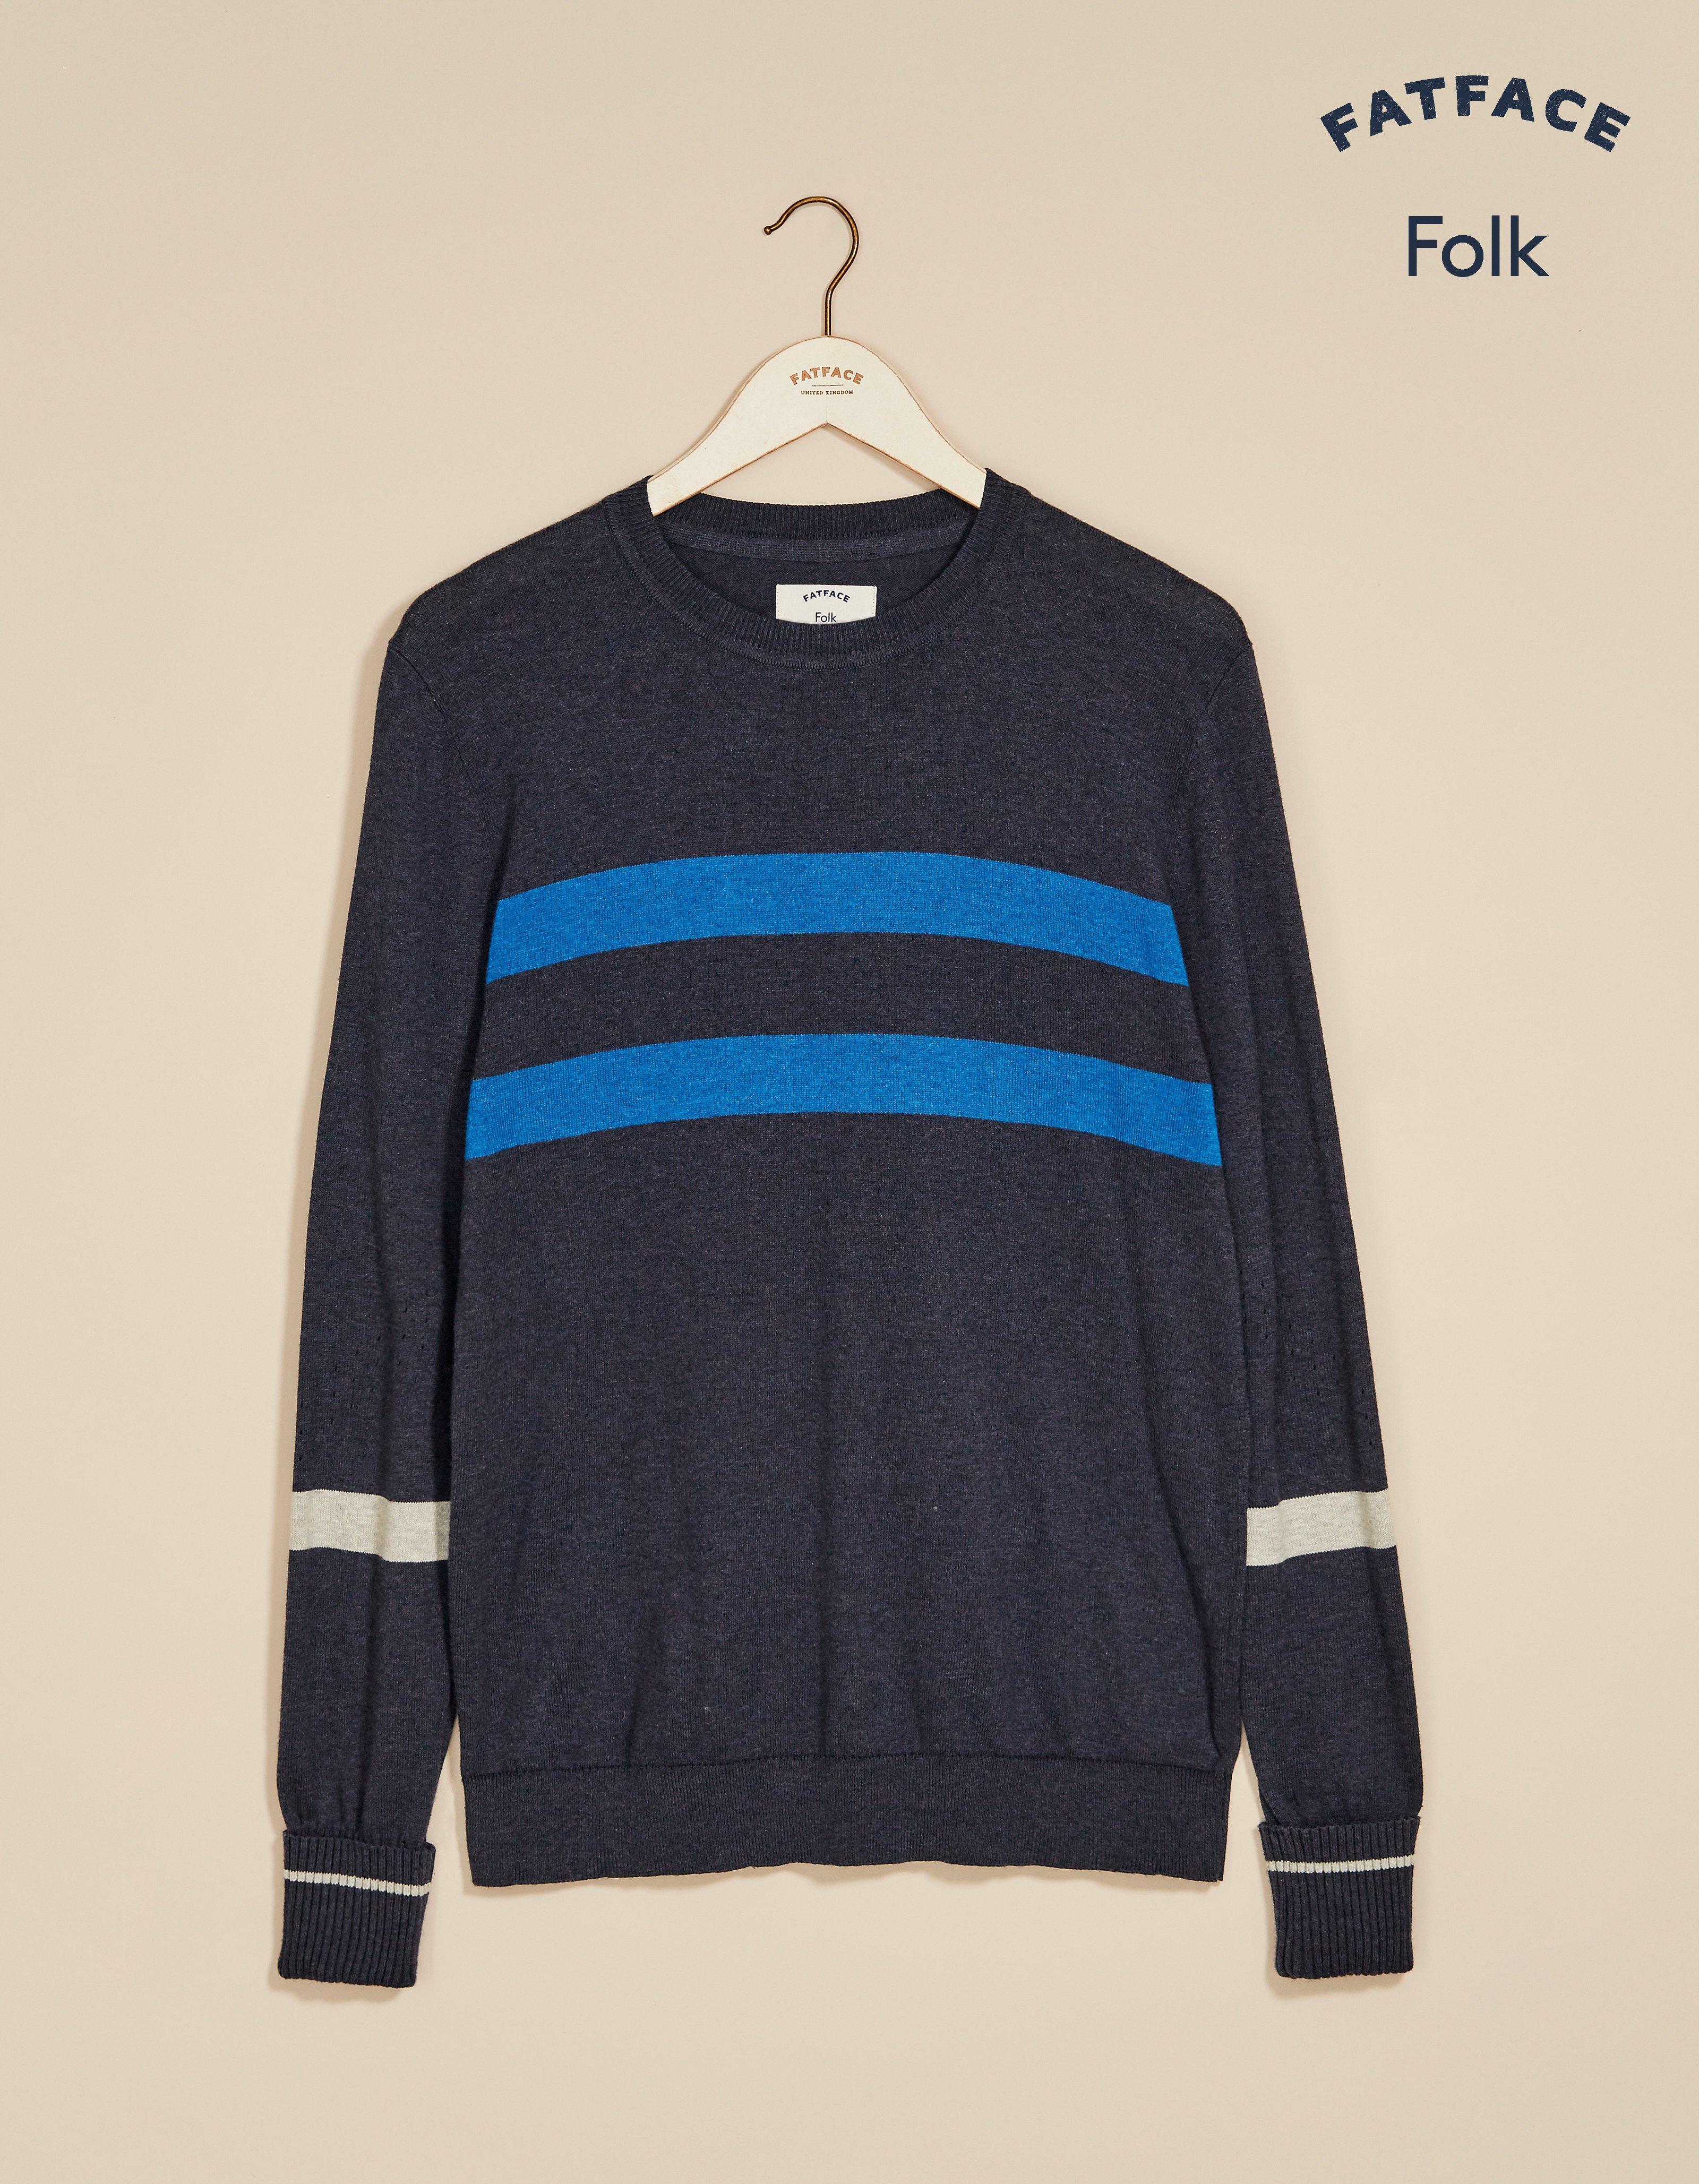 fat face folk pointelle crew neck sweater